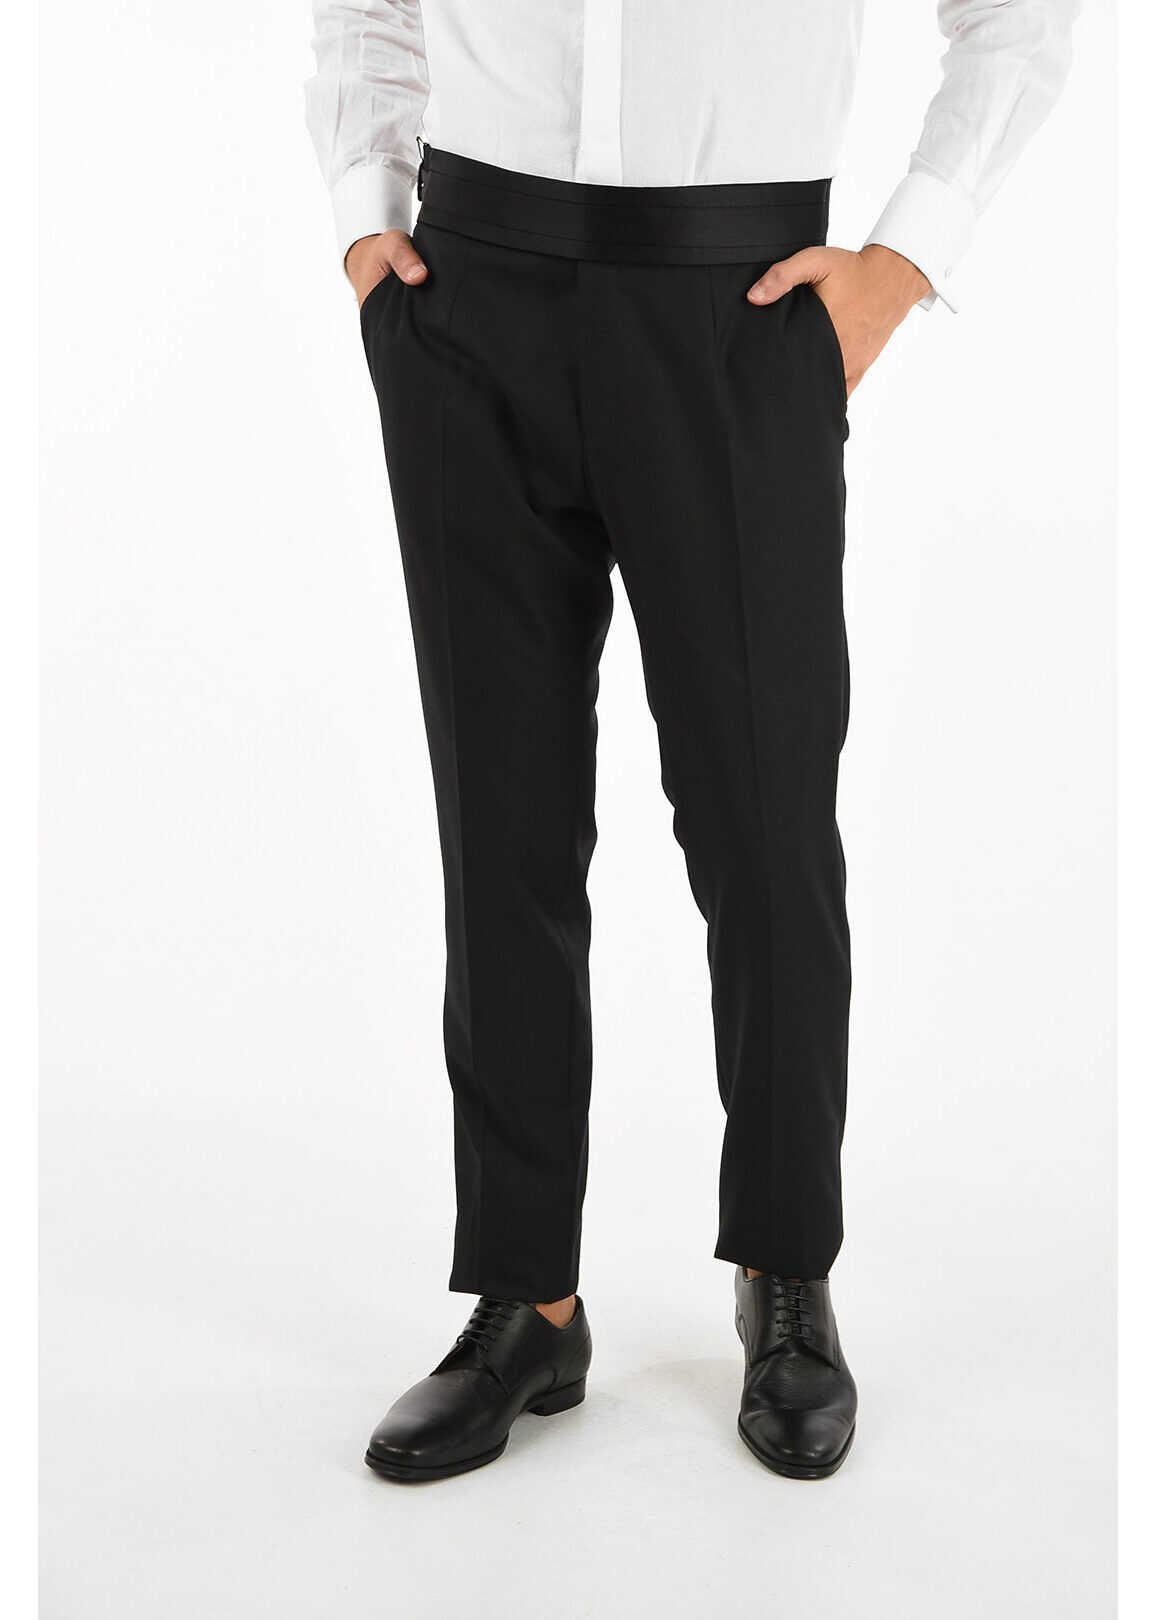 Dolce & Gabbana Virgin wool and silk pants with belt BLACK imagine